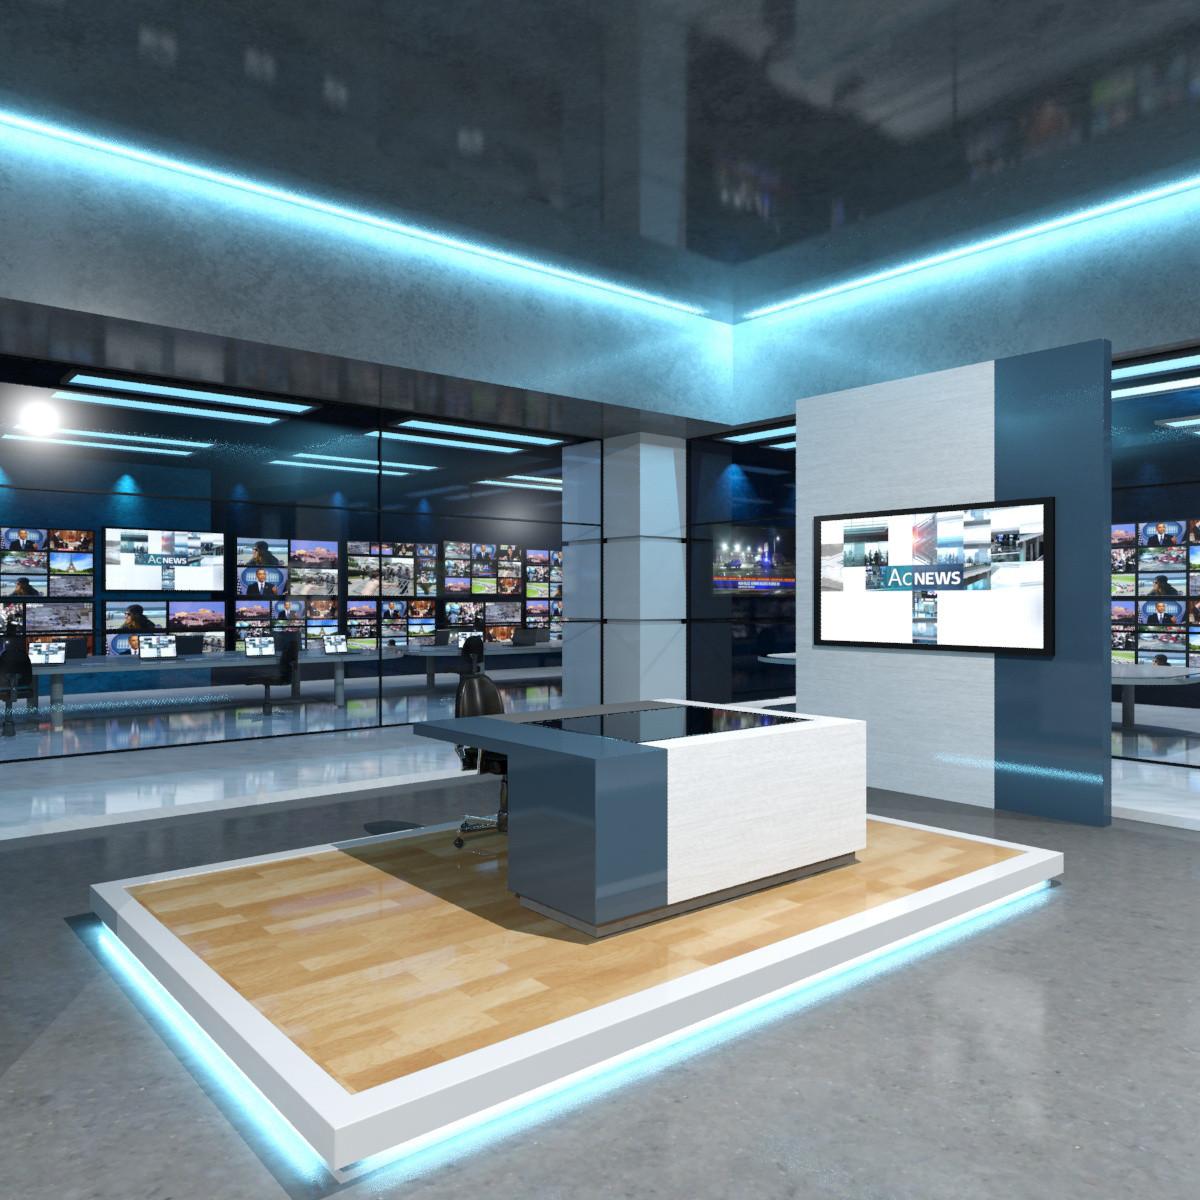 3ds max virtual set news studio